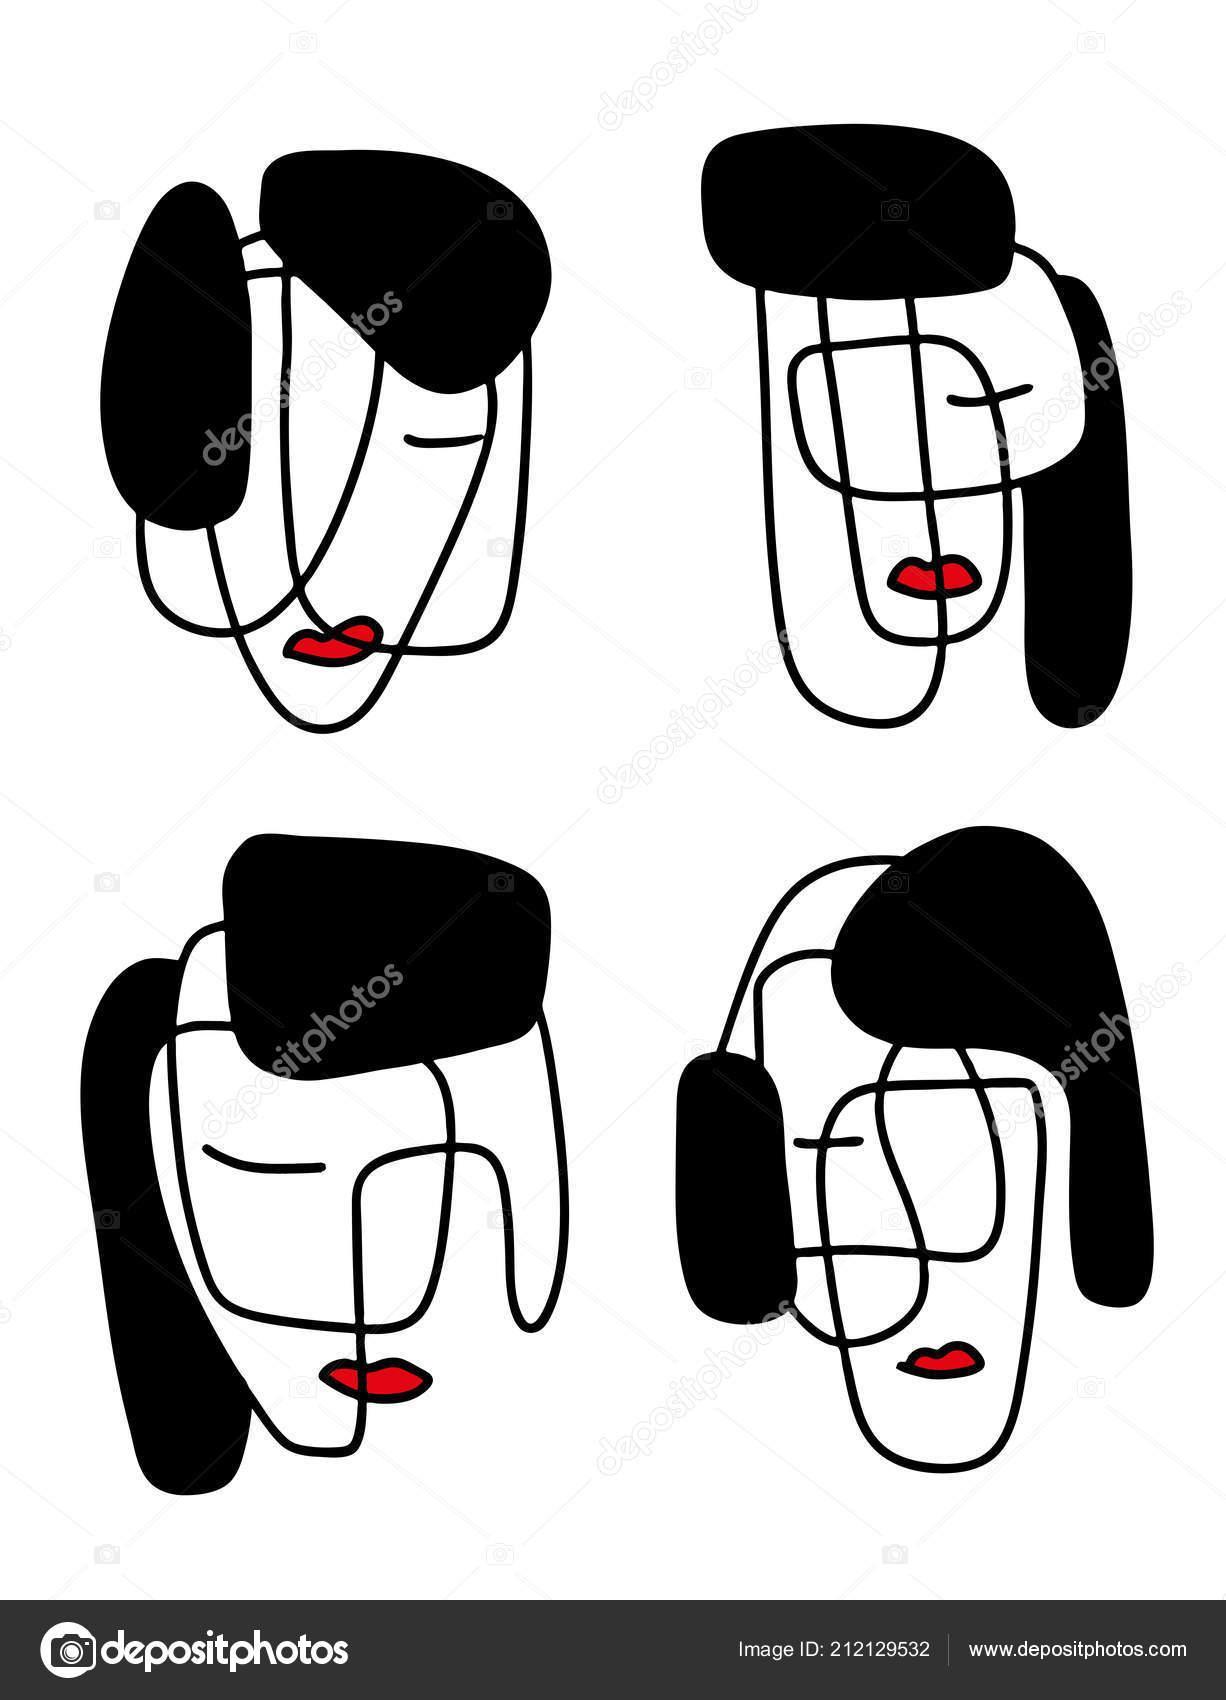 Abstract Portraits Vector Illustration Minimalistic Line Art